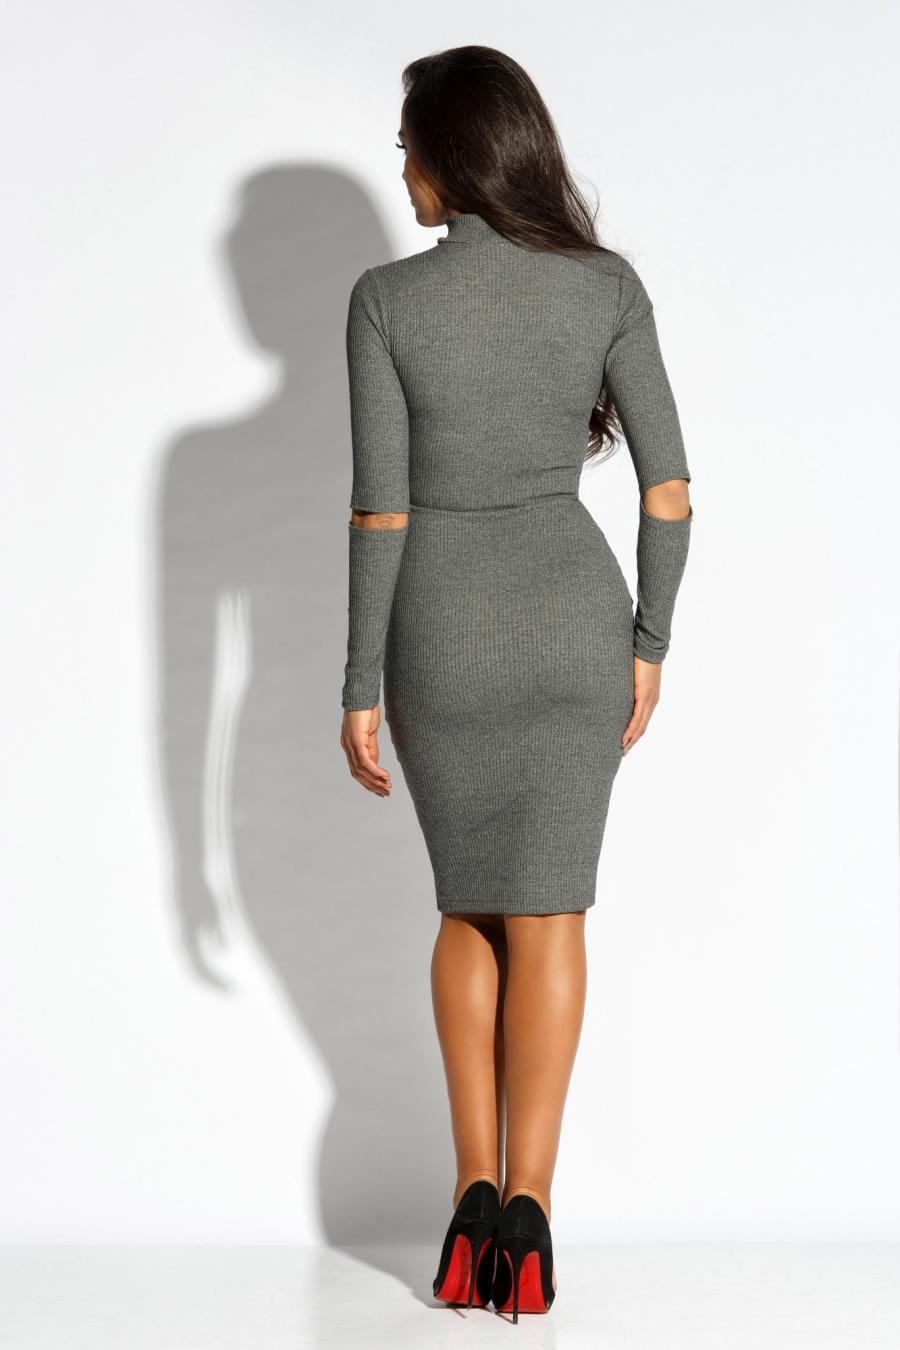 5cd84a89 Dzianinowa Elegancka Sukienka Szara Rico